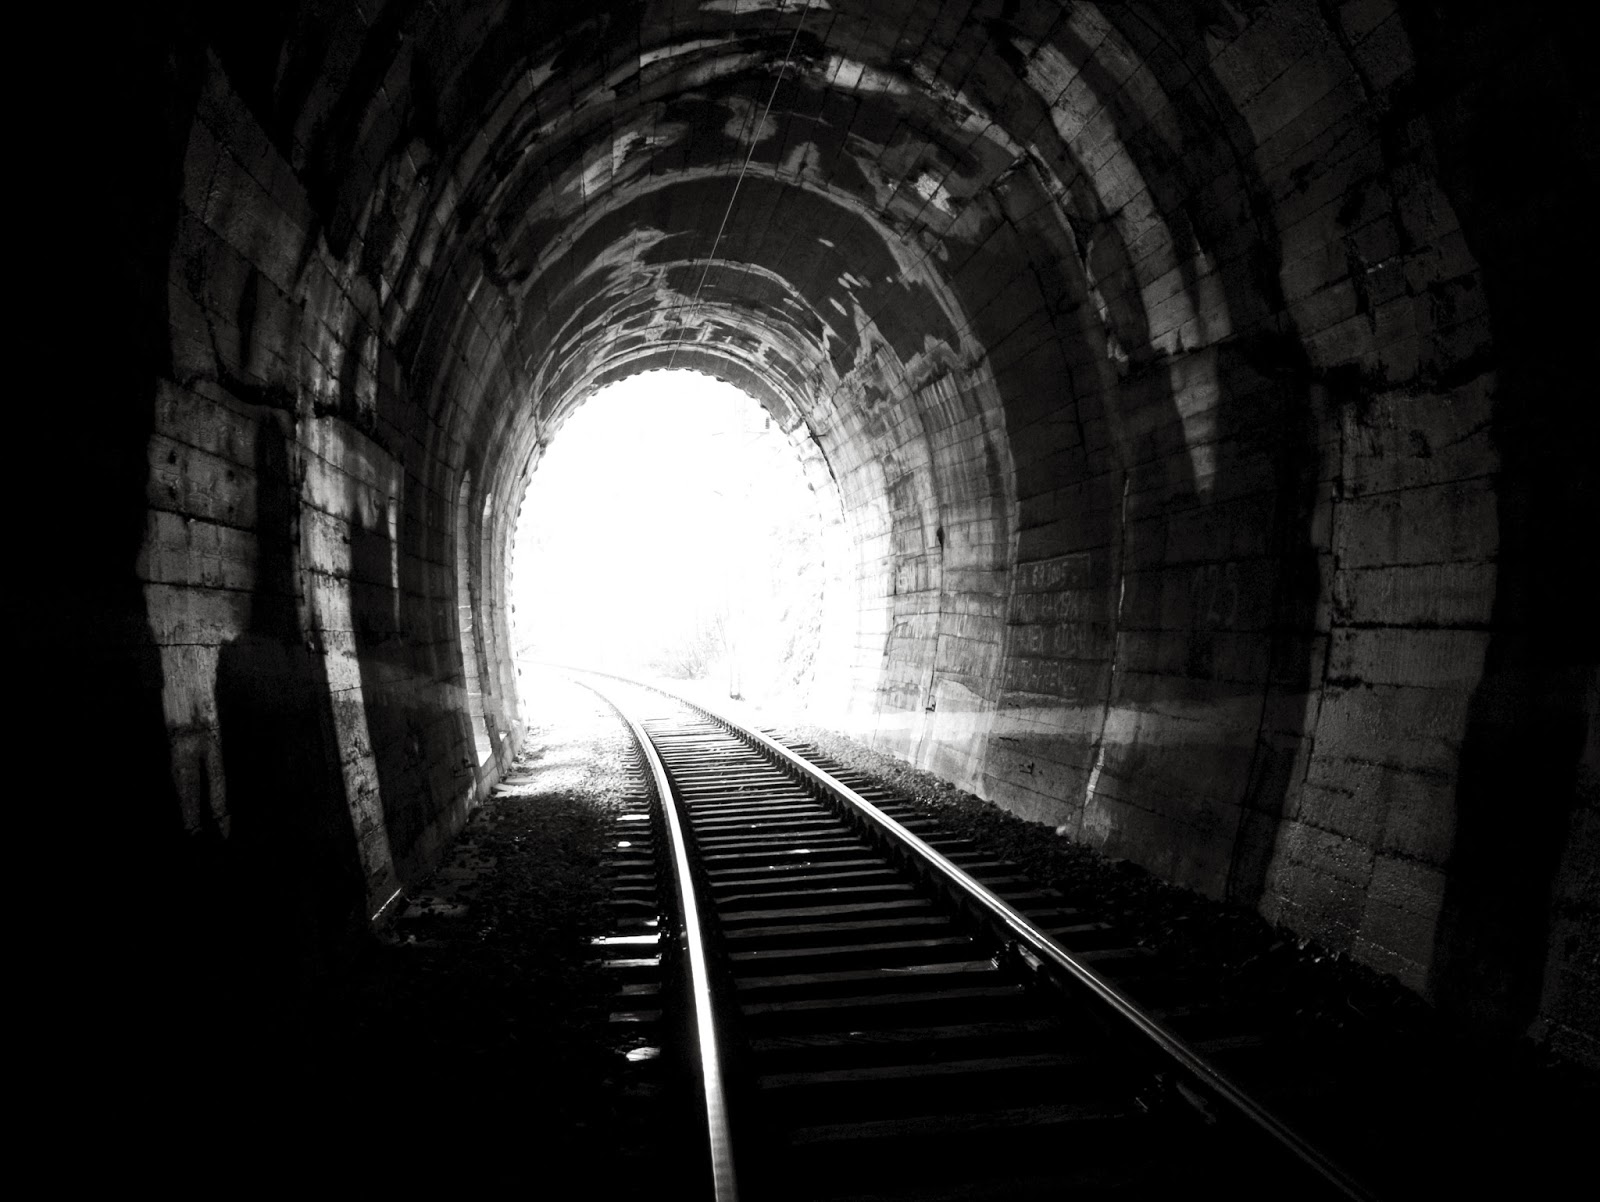 Siapa dalang 'Terowong Larkin'?